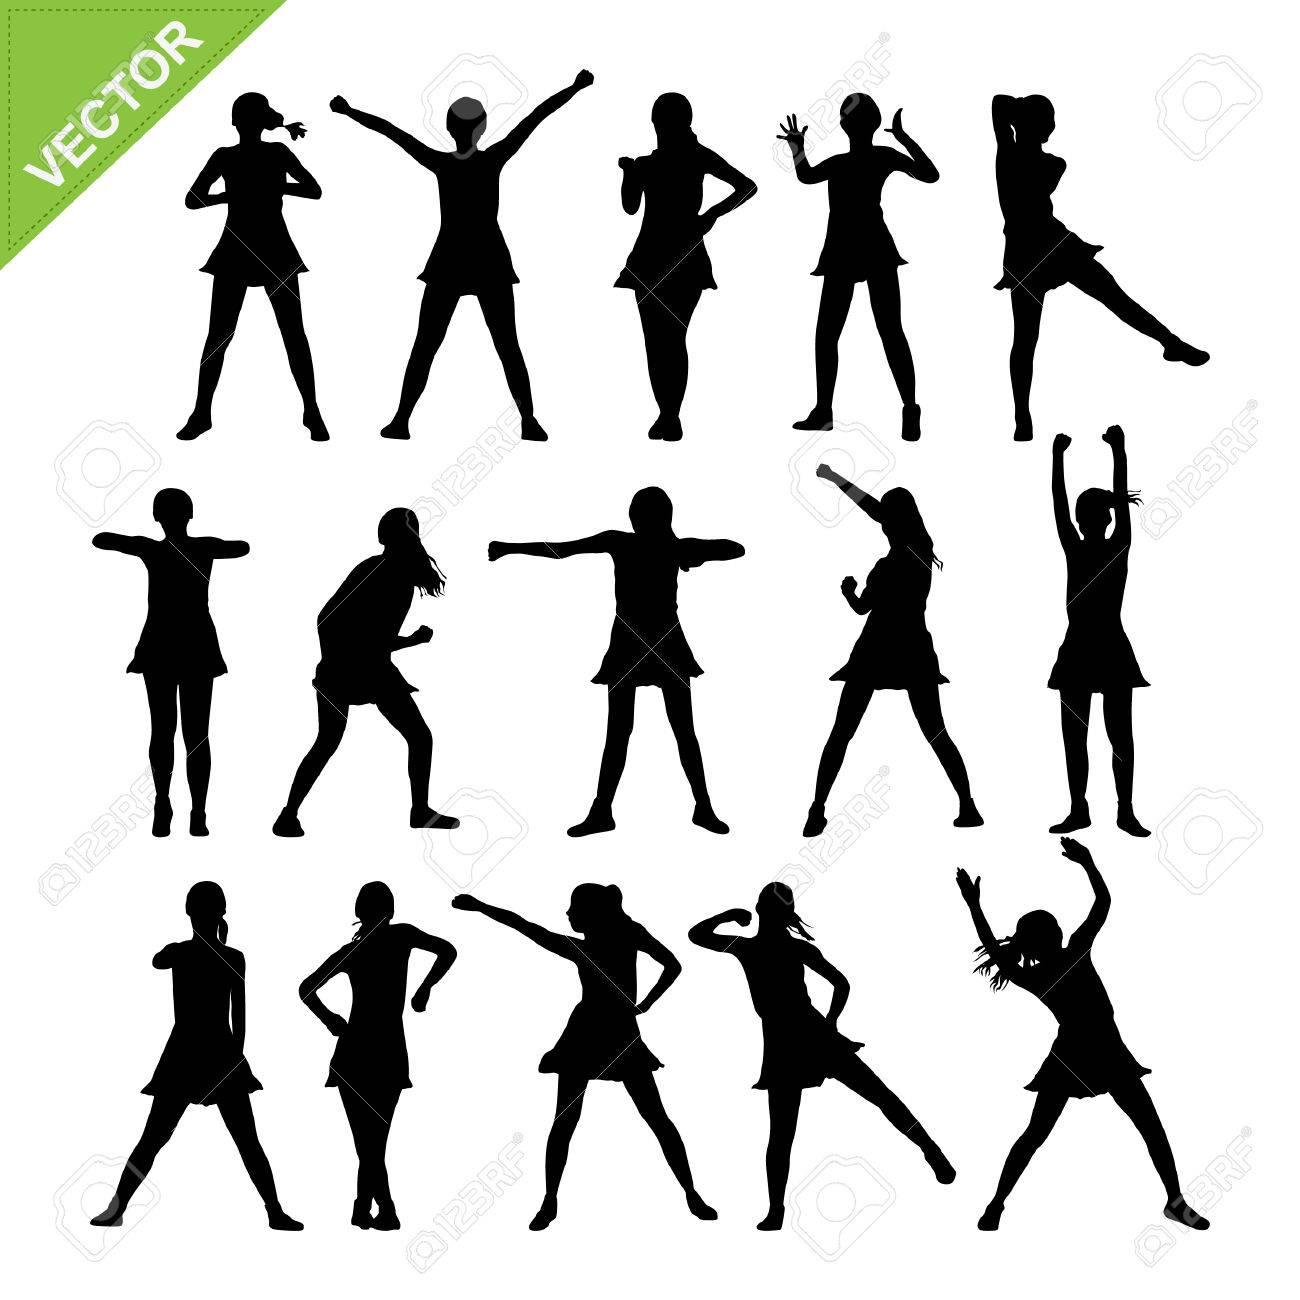 Aerobic dance silhouettes vector - 23111780